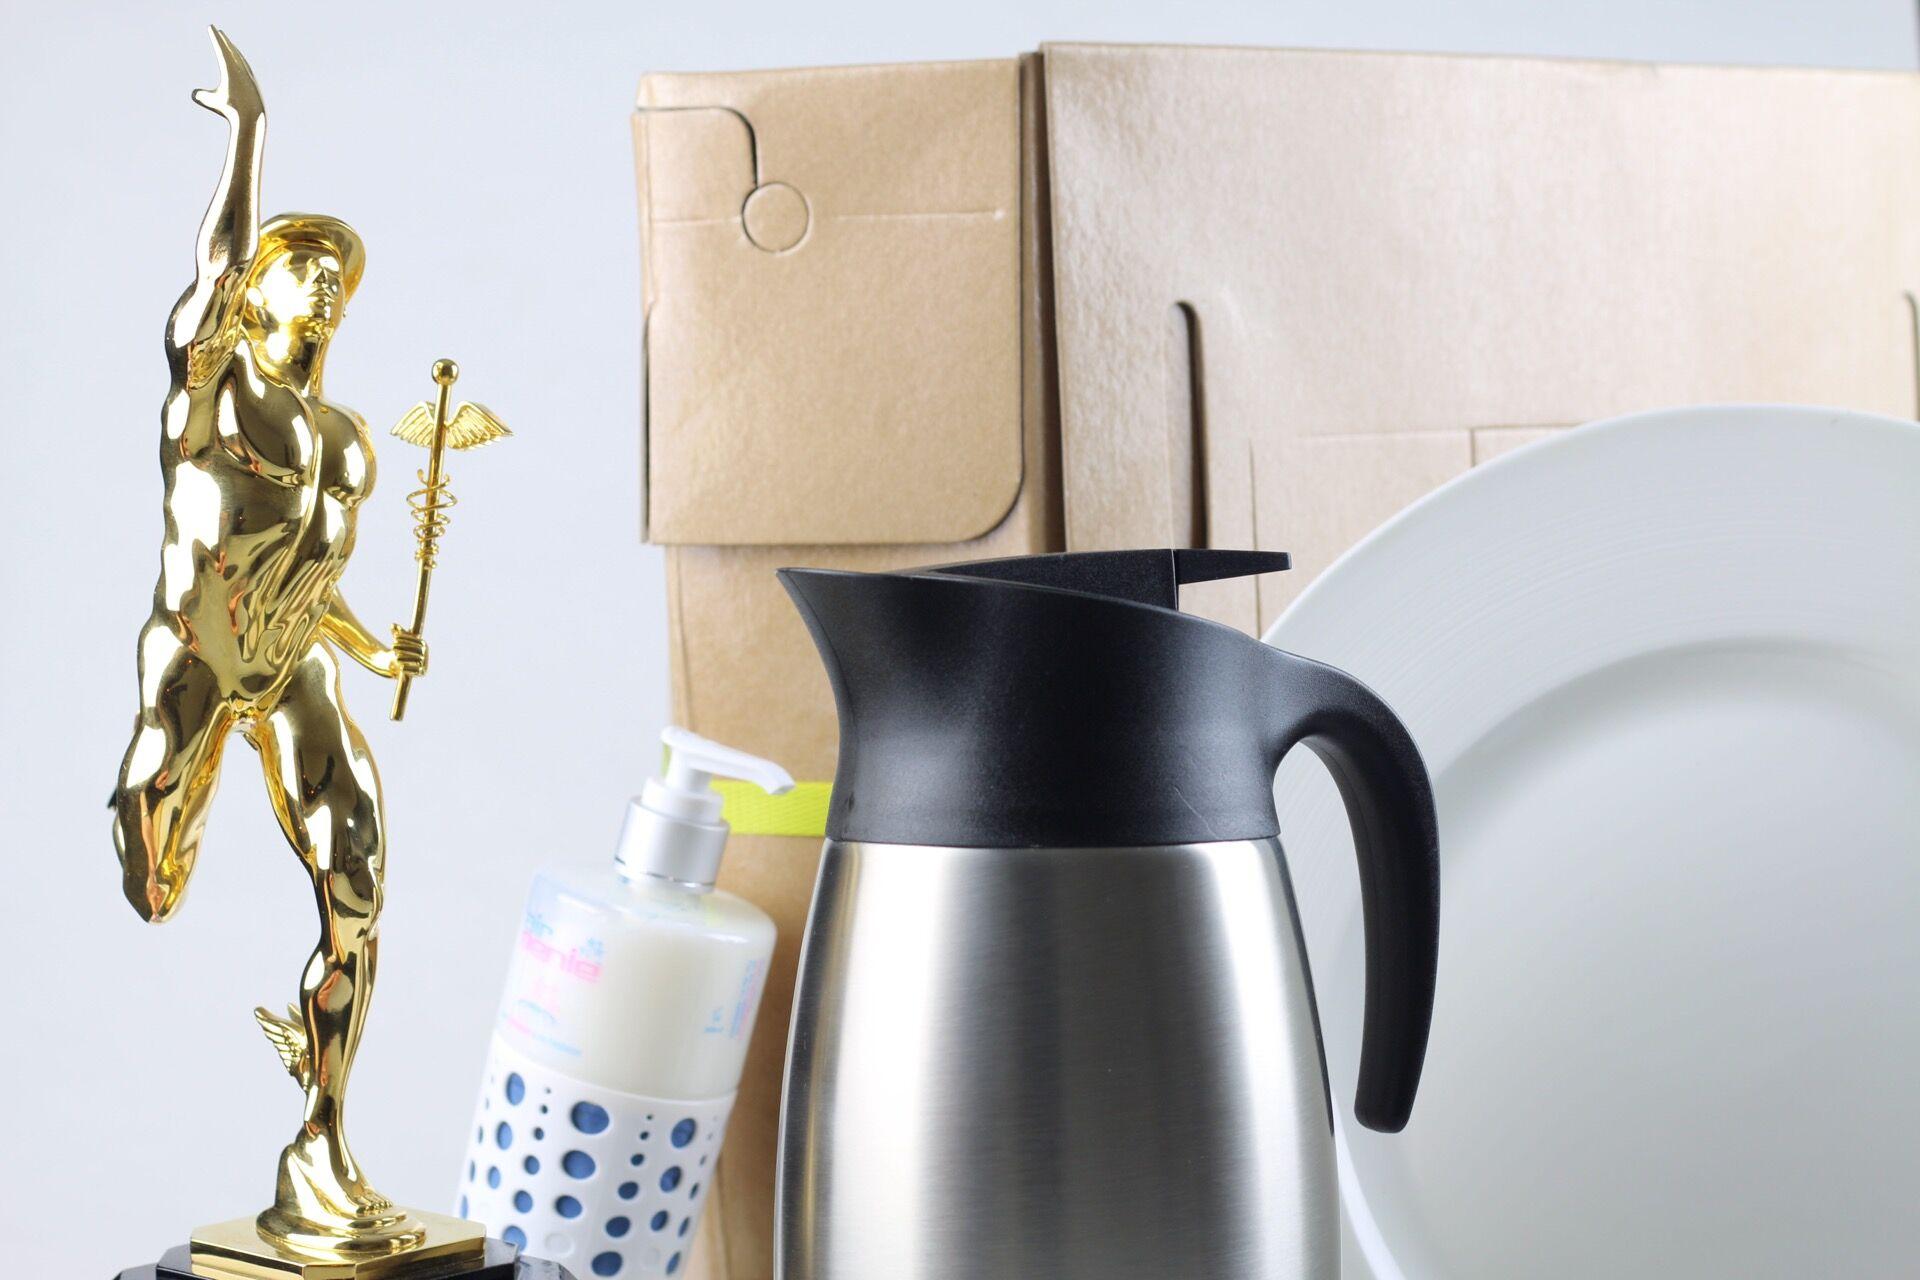 IFCA Mercury Award Winning Products